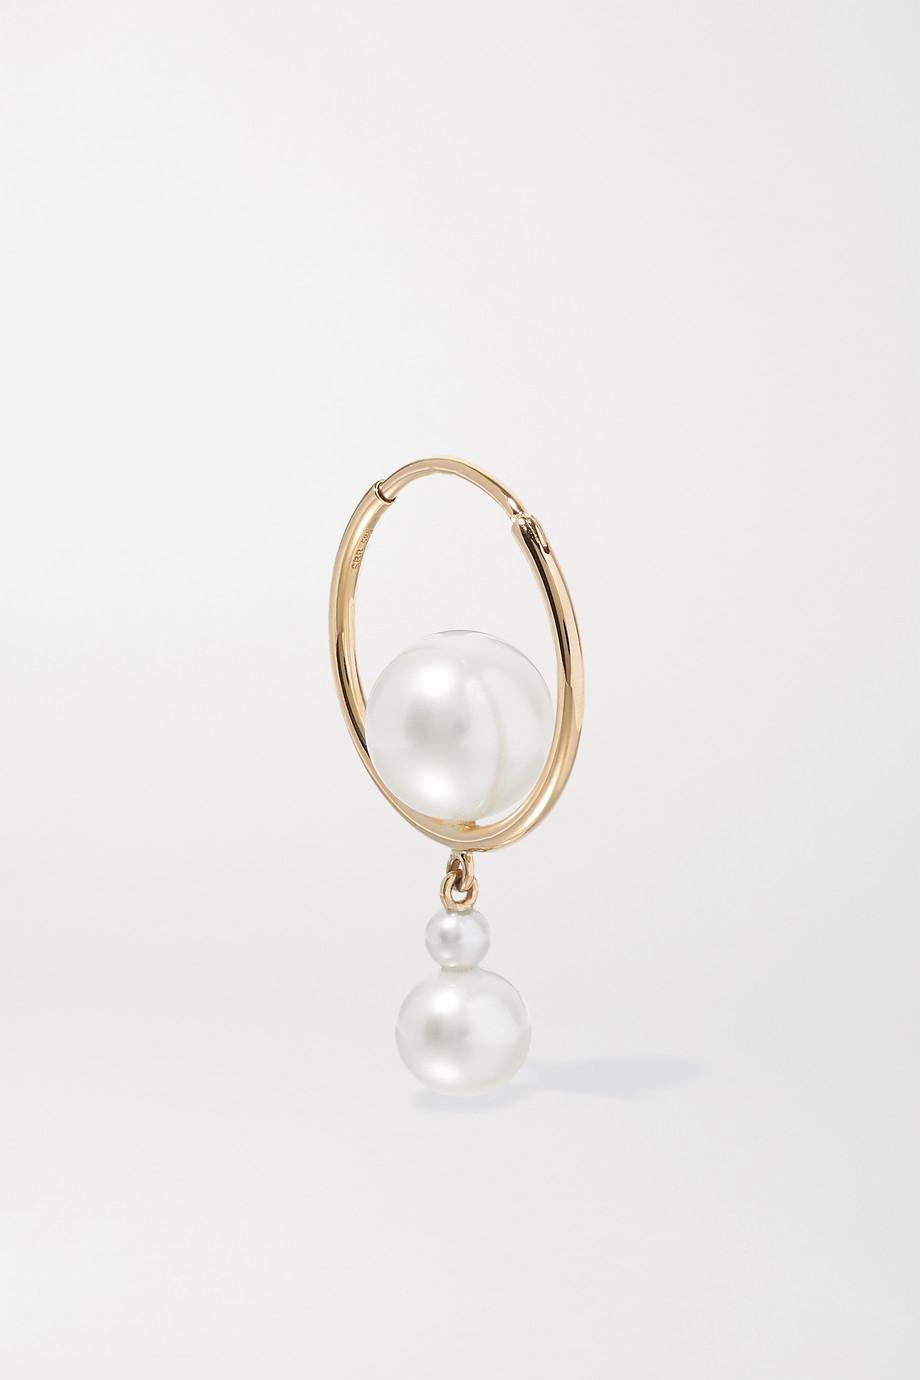 Sophie Bille Brahe Babylon Elipse 14-karat gold pearl hoop earring